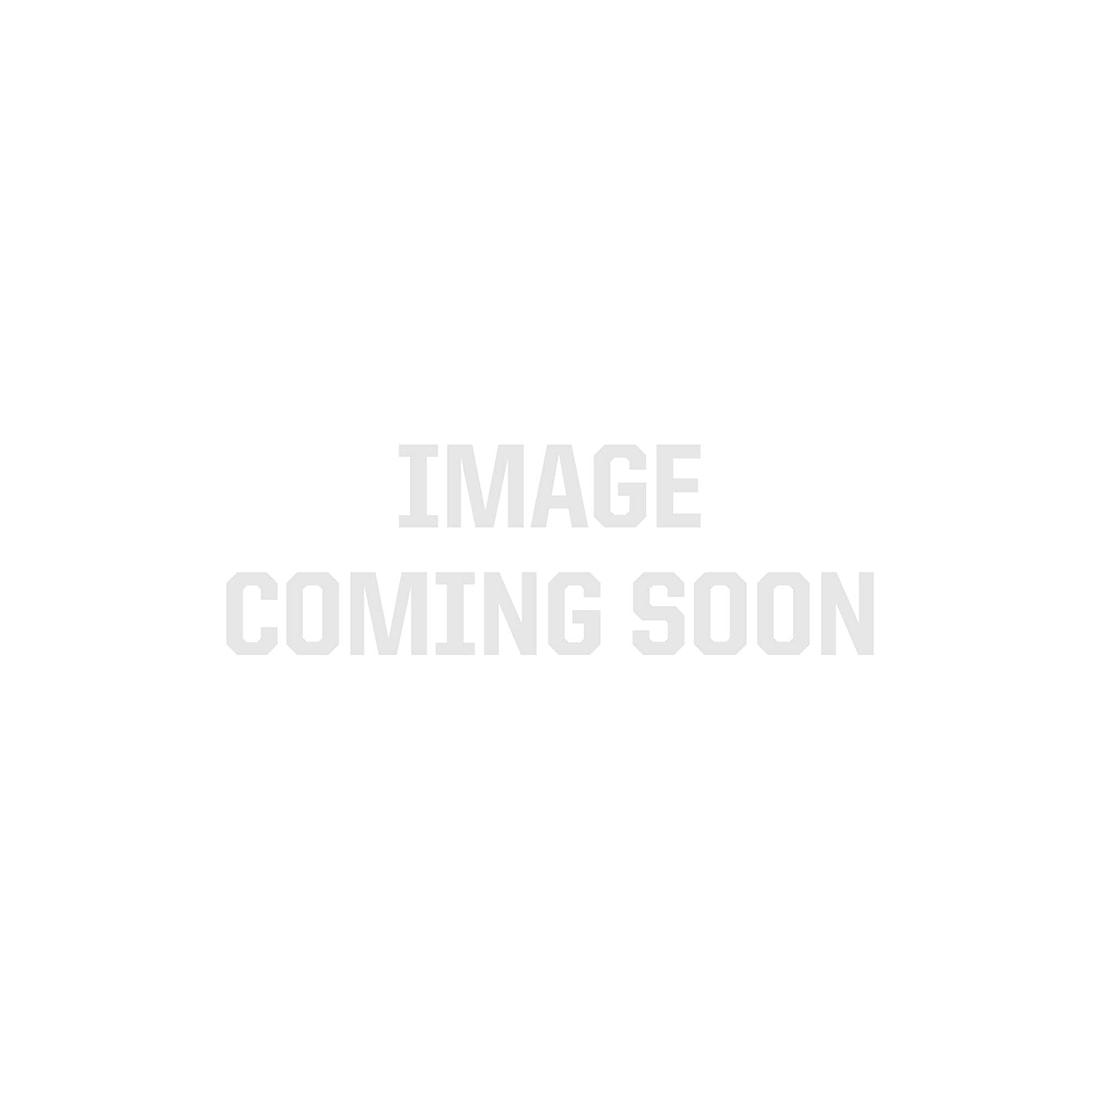 MaxLite 1x4 Direct Lit LED Flat Panel Economical Series, 33 Watts